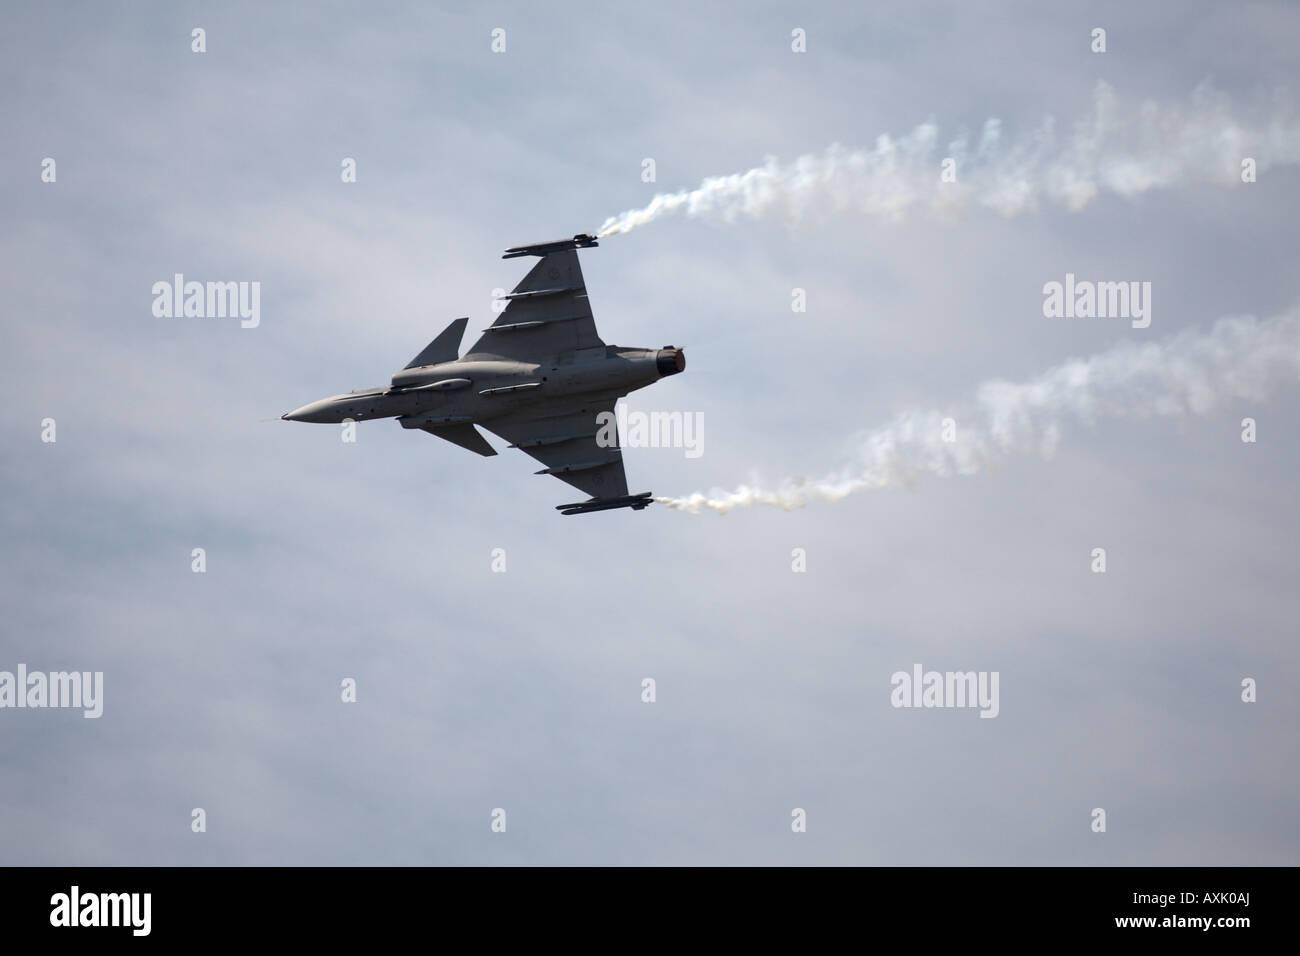 SAAB Gripen aircraft on flying display at Farnborough International Airshow July 2006 - Stock Image